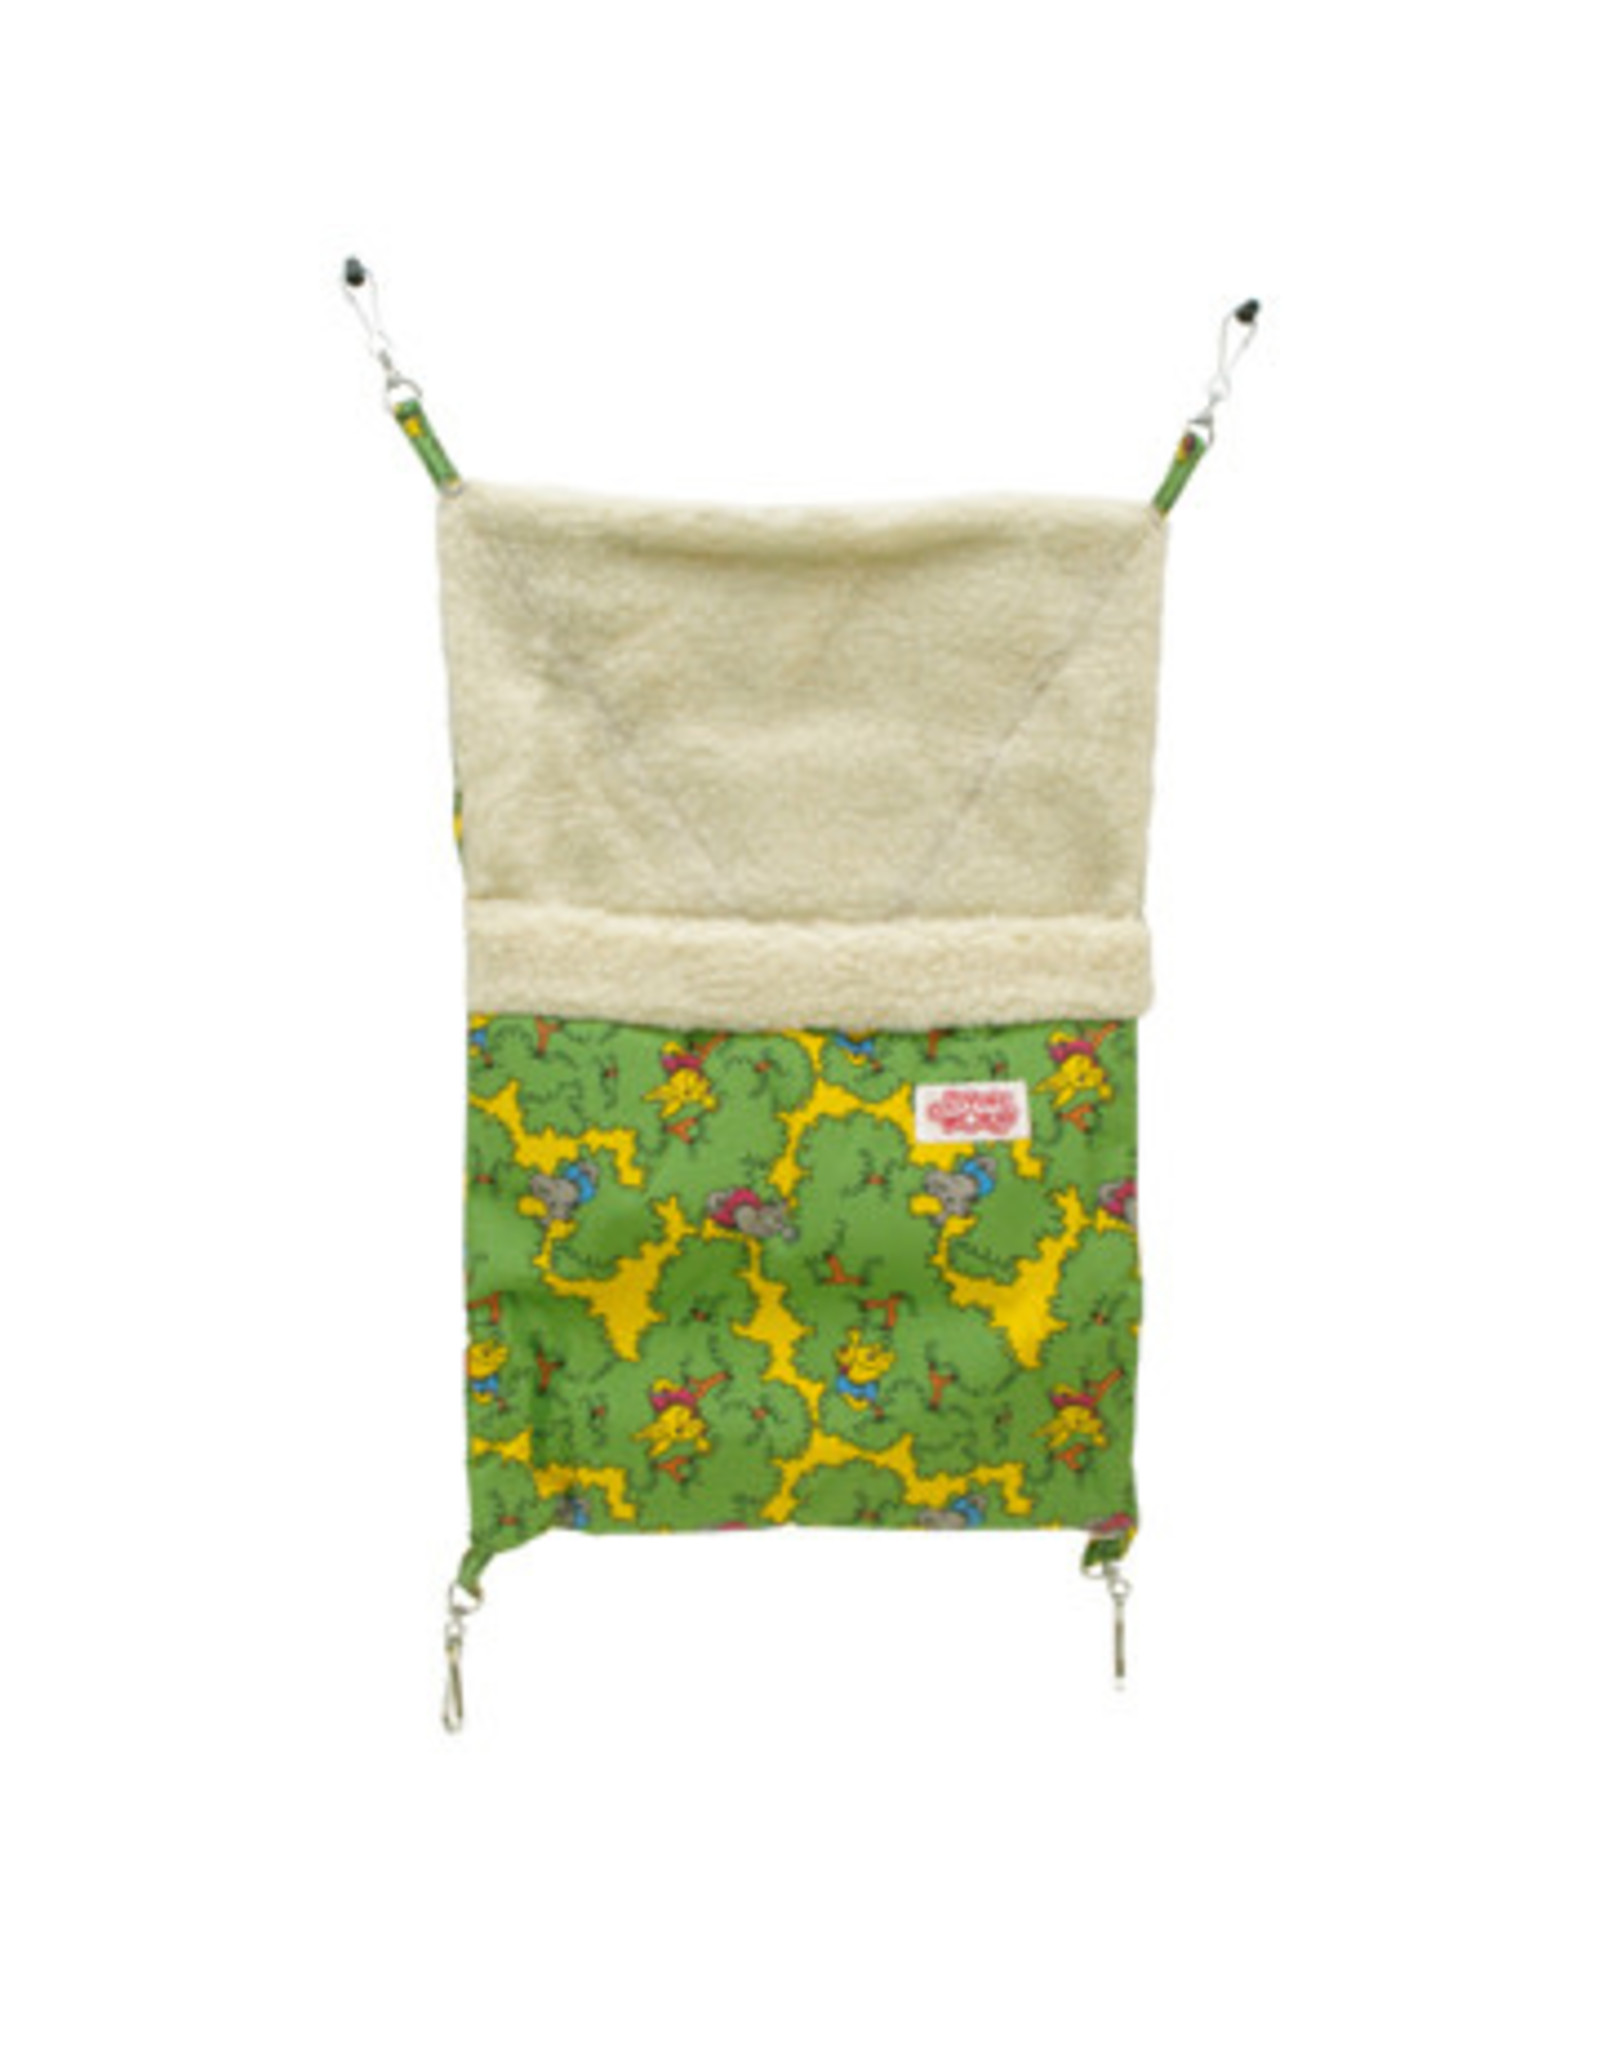 Living World Ferret Sleeping Bag - Green - 29 x 44 cm (12 x 17.5 in)